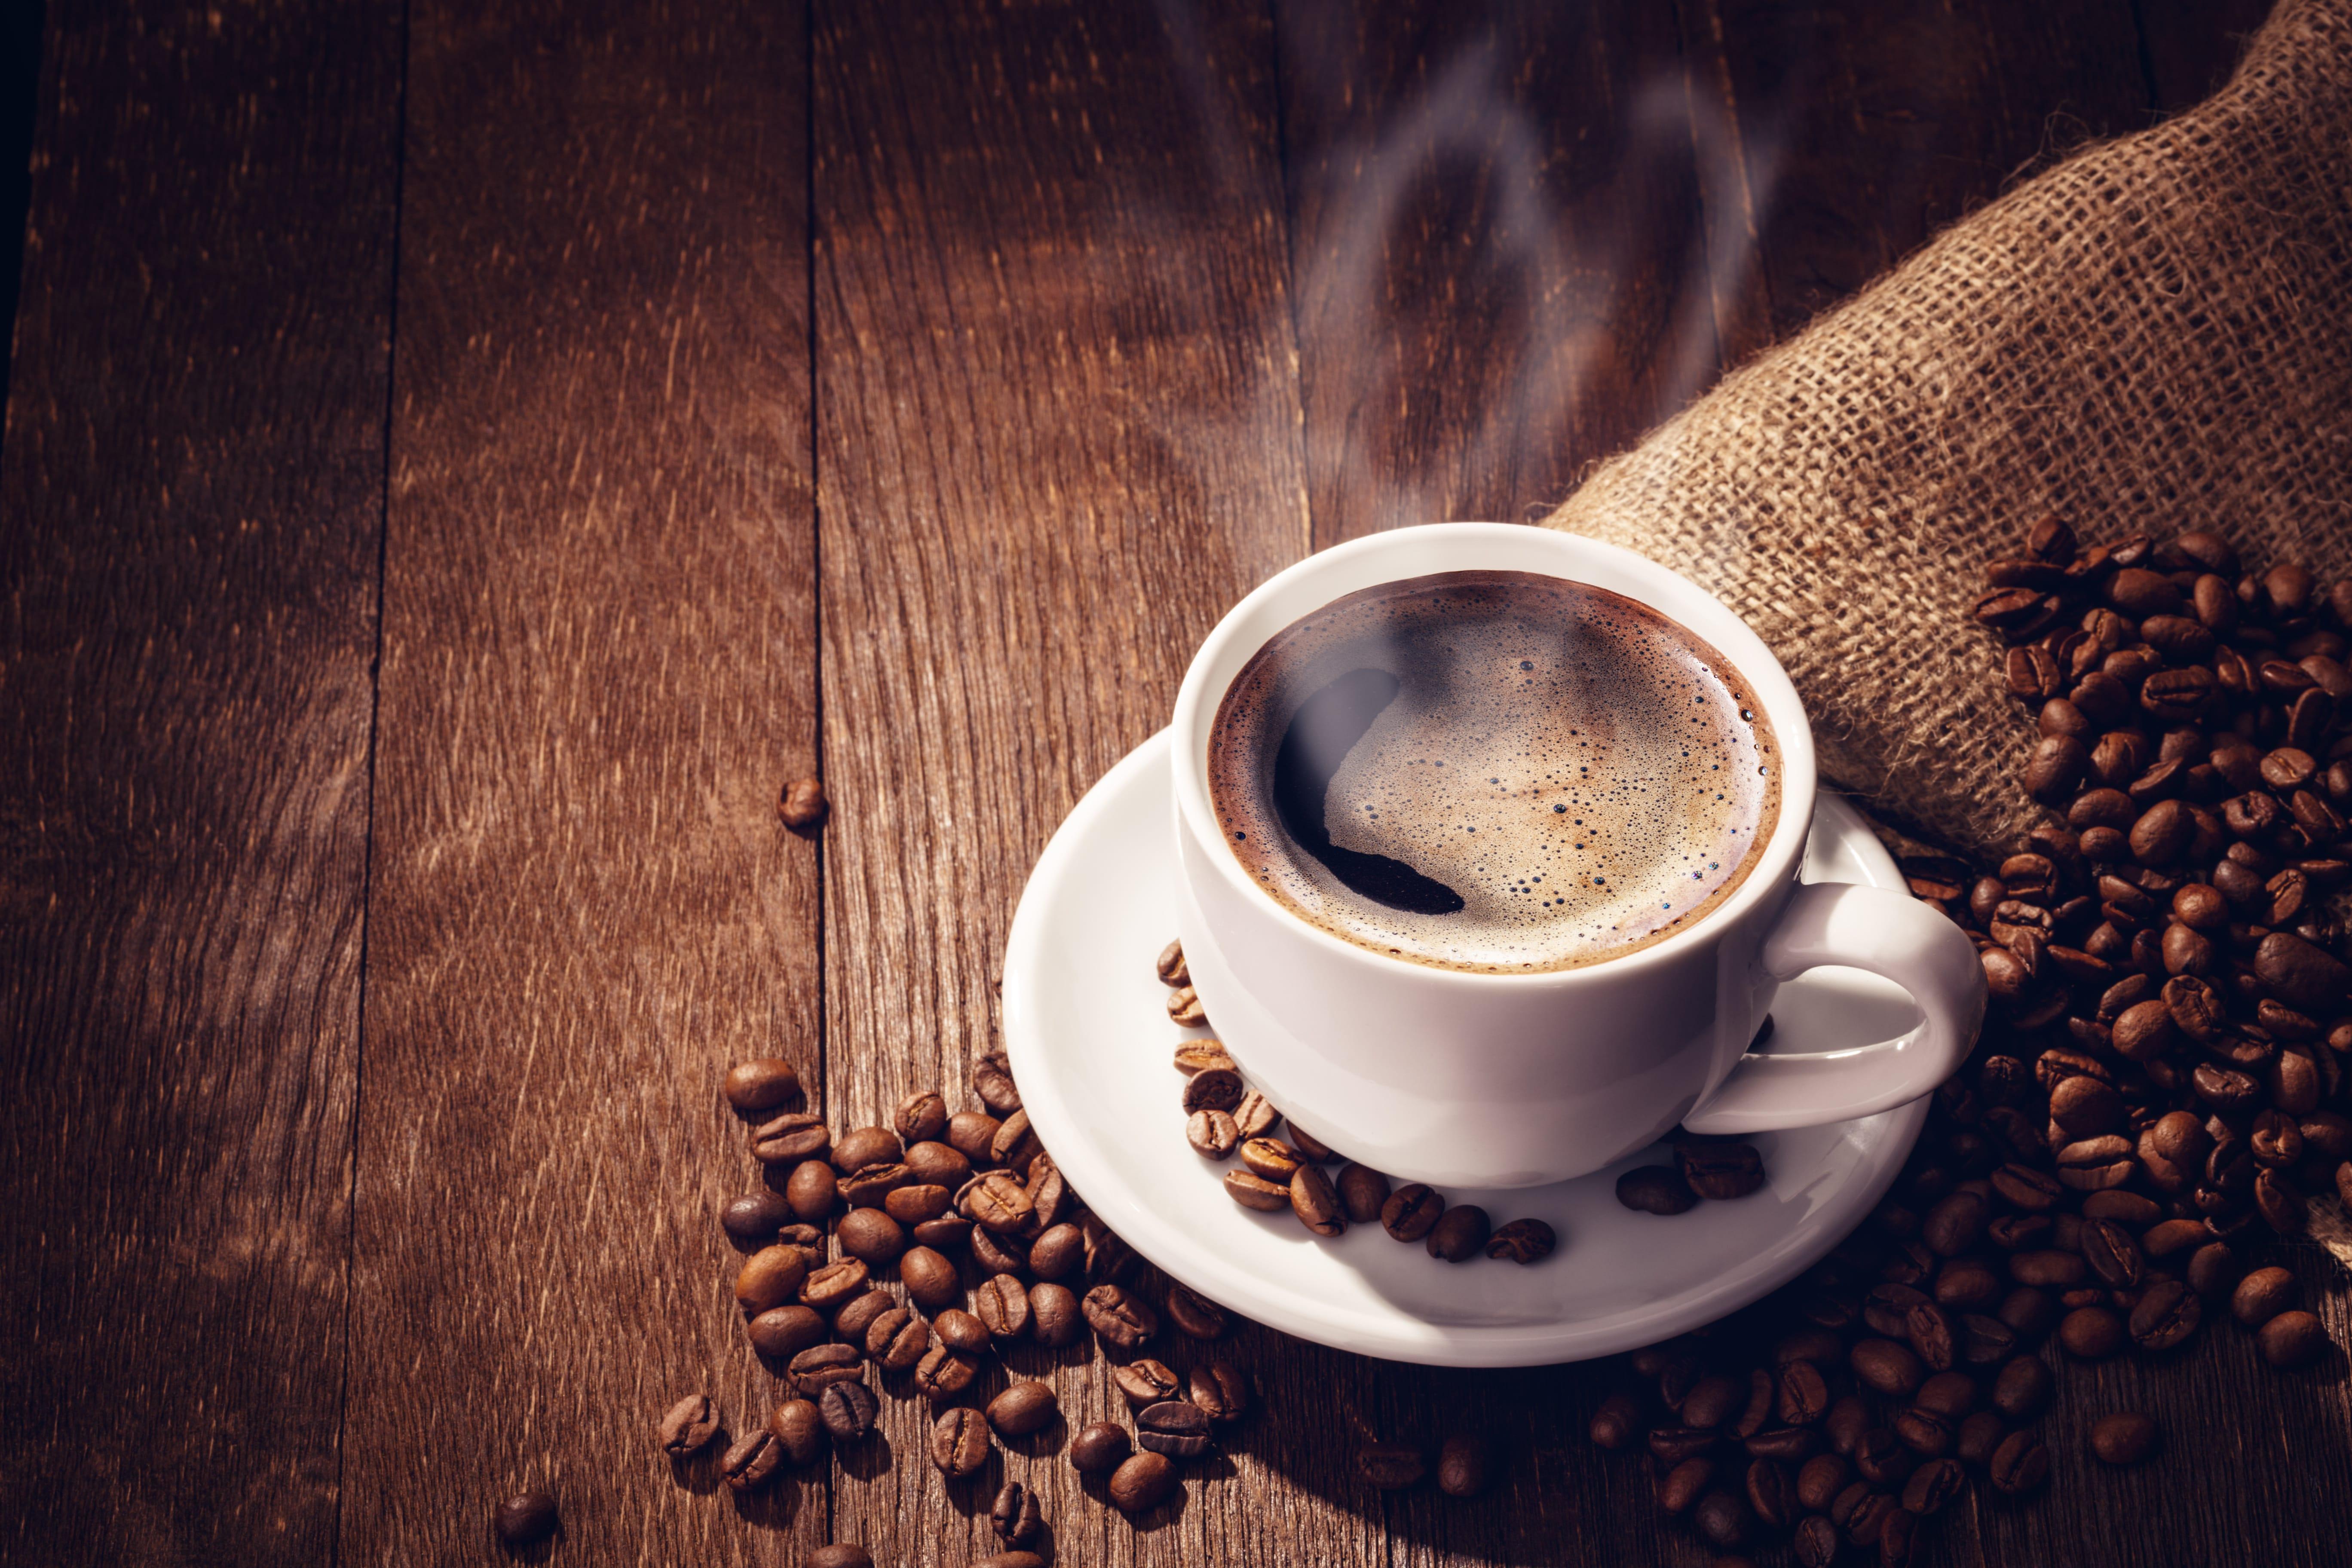 Kaffee: Espresso, Cappuccino & Co. selbst zubereiten